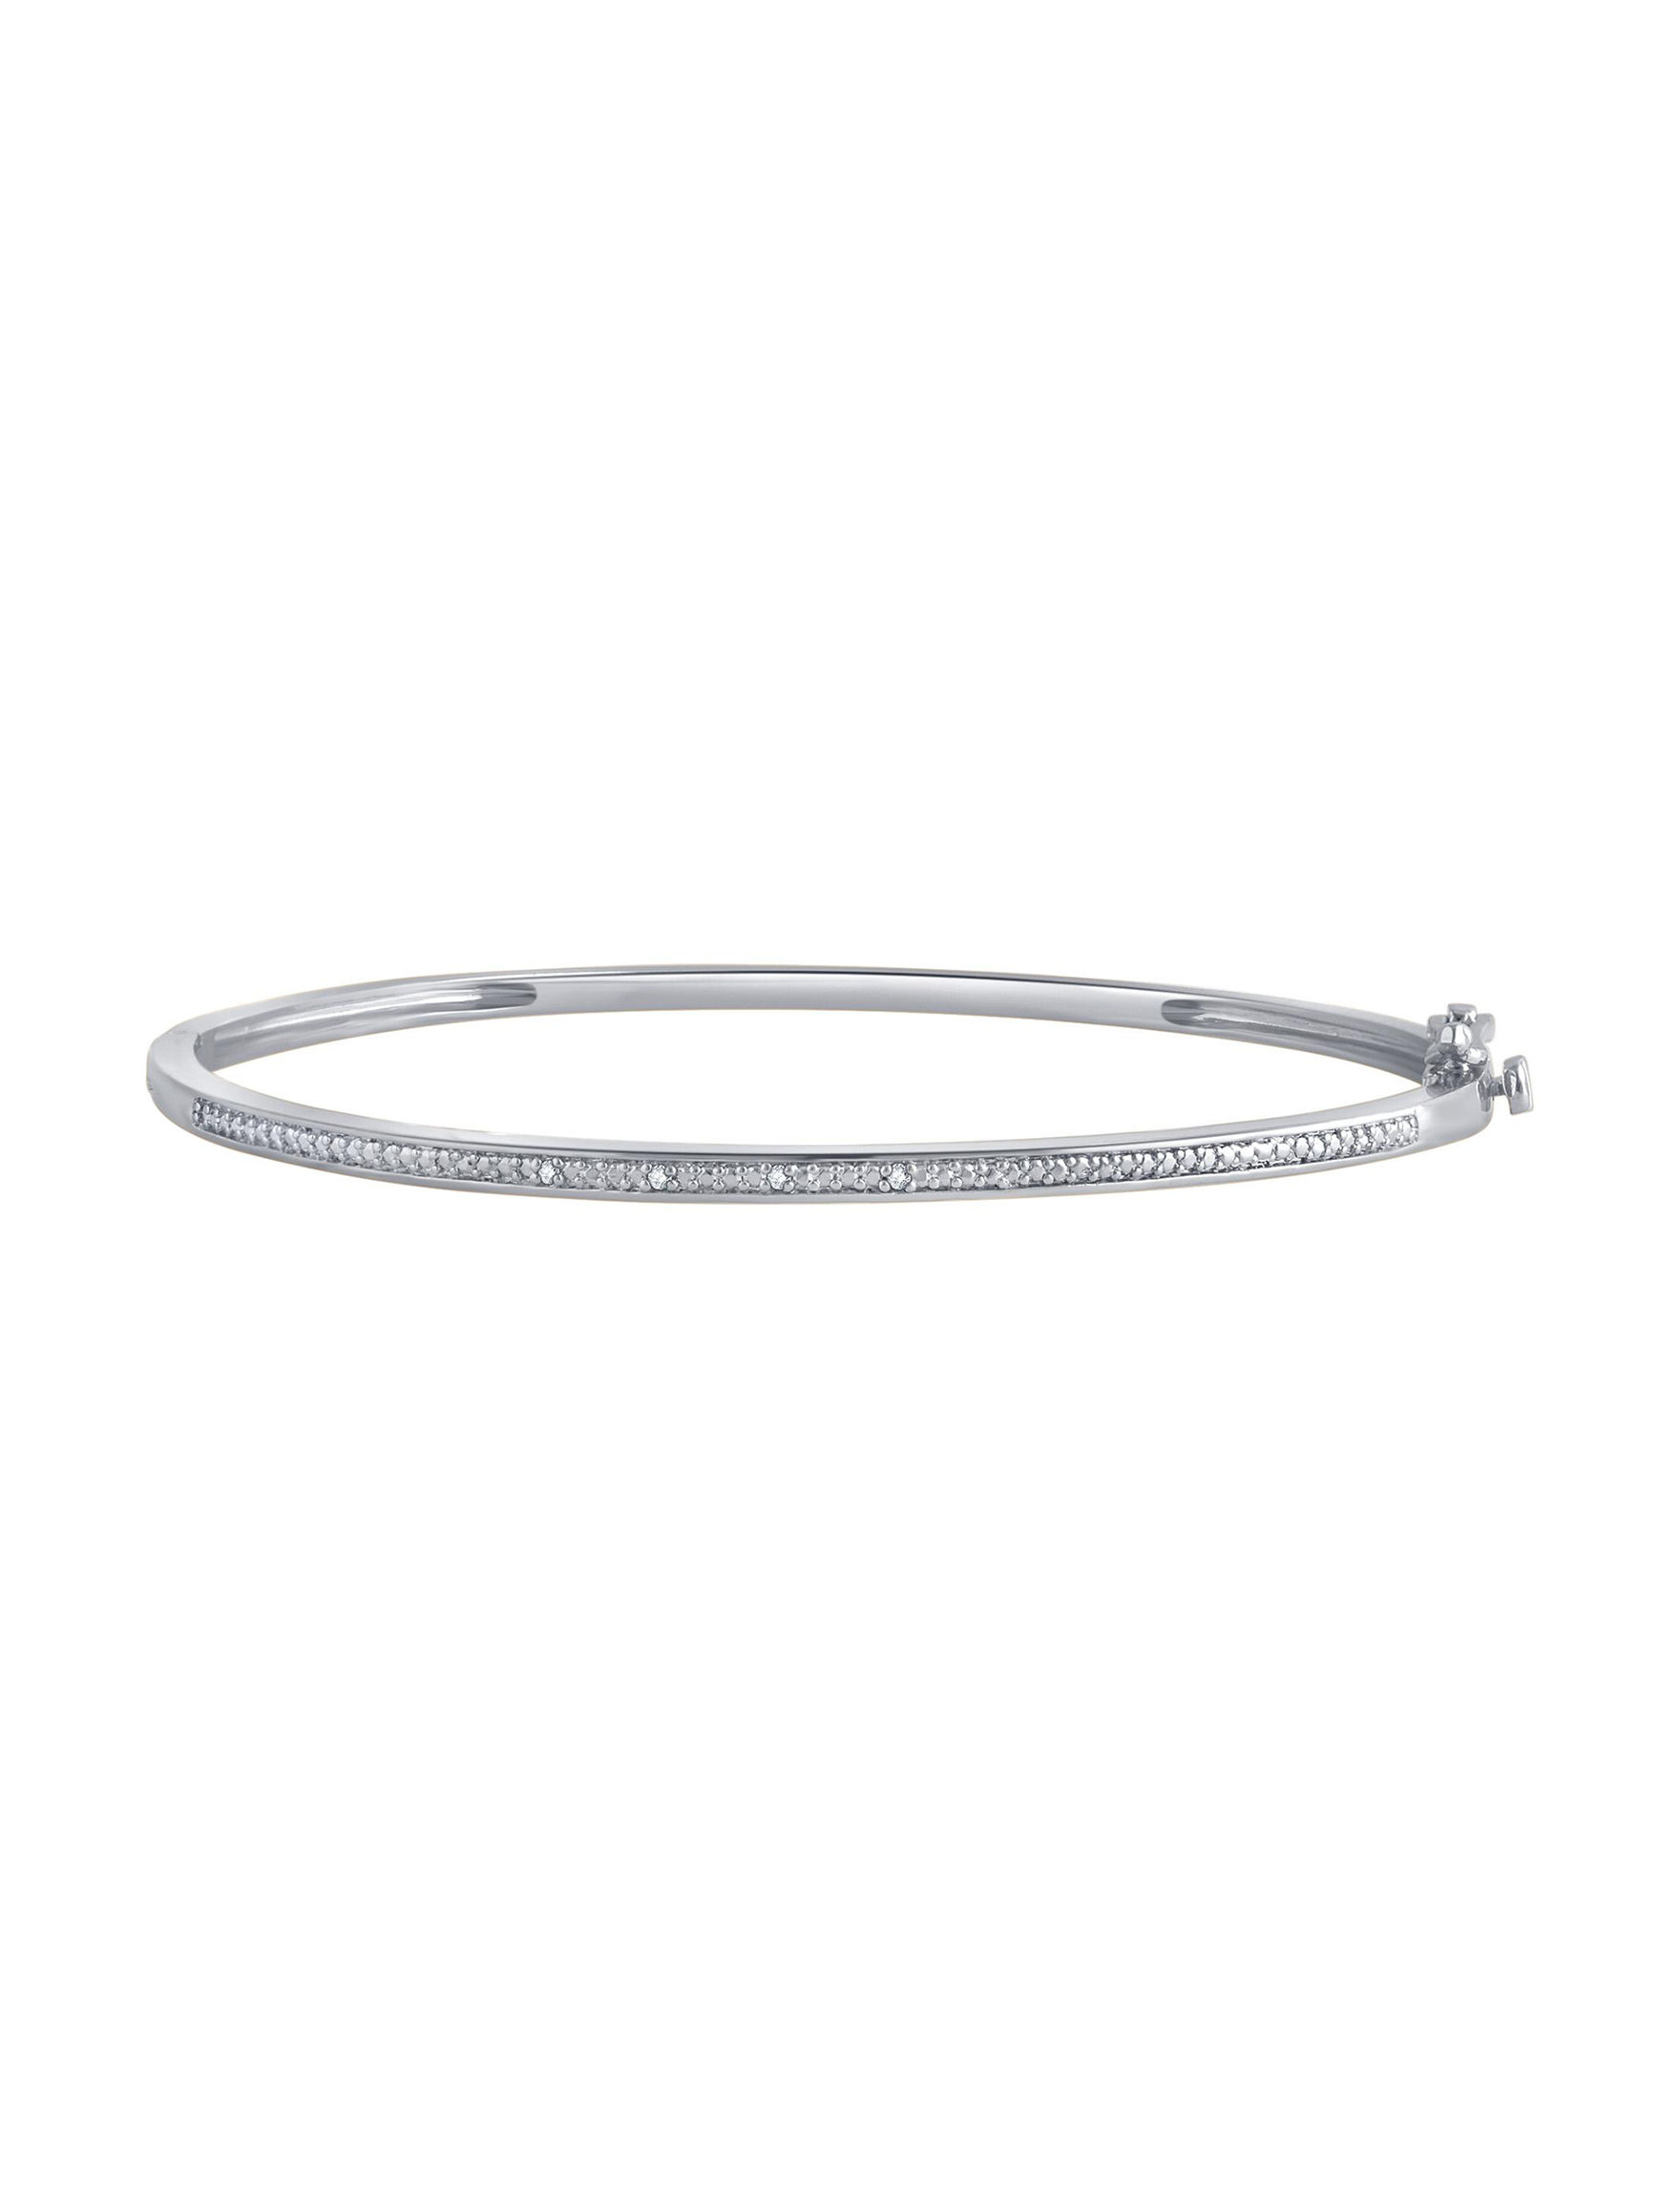 Silver Bracelets Fine Jewelry